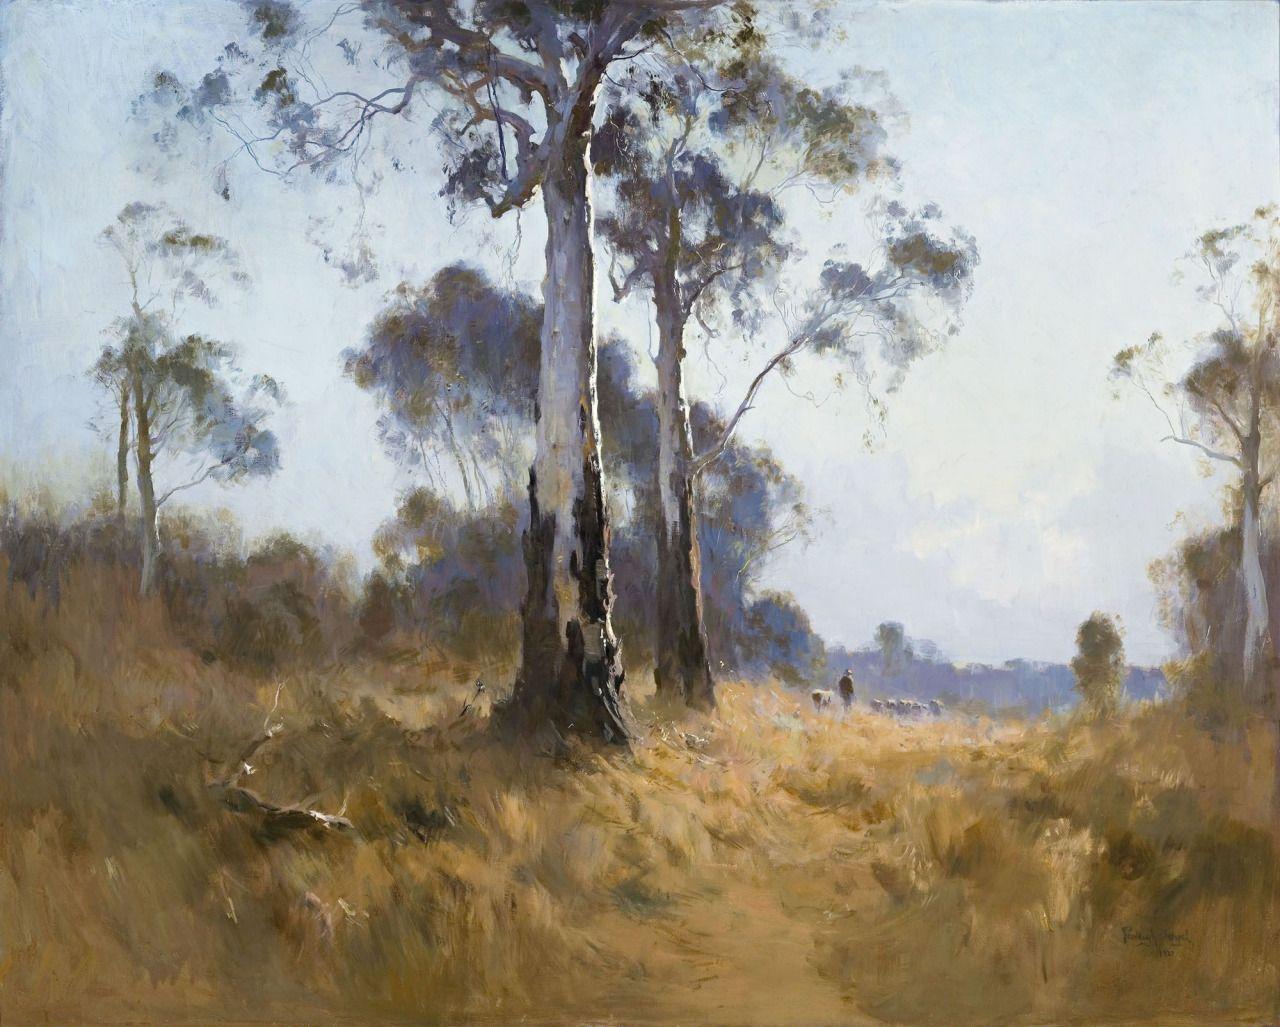 Penleigh Boyd